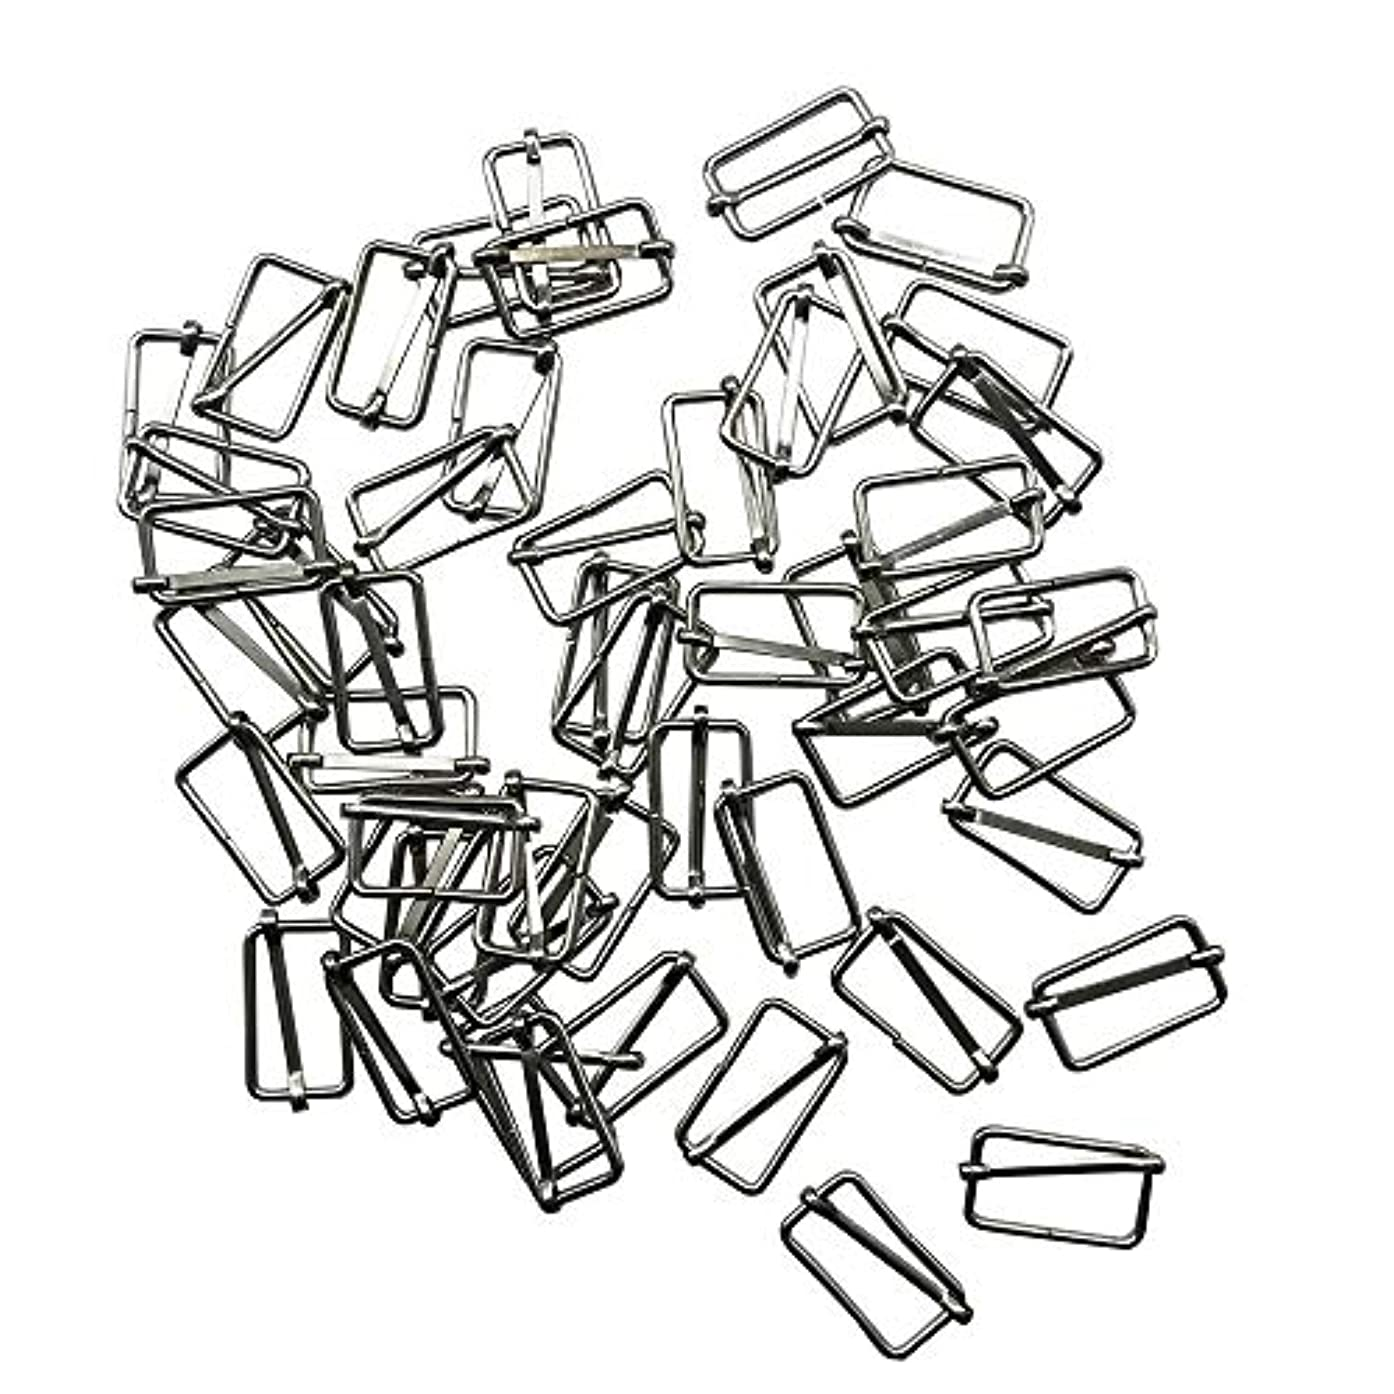 50 Pieces Slide Buckle 1 inch 1 1/2 inch 2 inch Metal Triglide Slides Rectangle Adjustable Webbing Slider for Fasteners, Strap, Backpack DIY Accessories (2 inch),Q2015